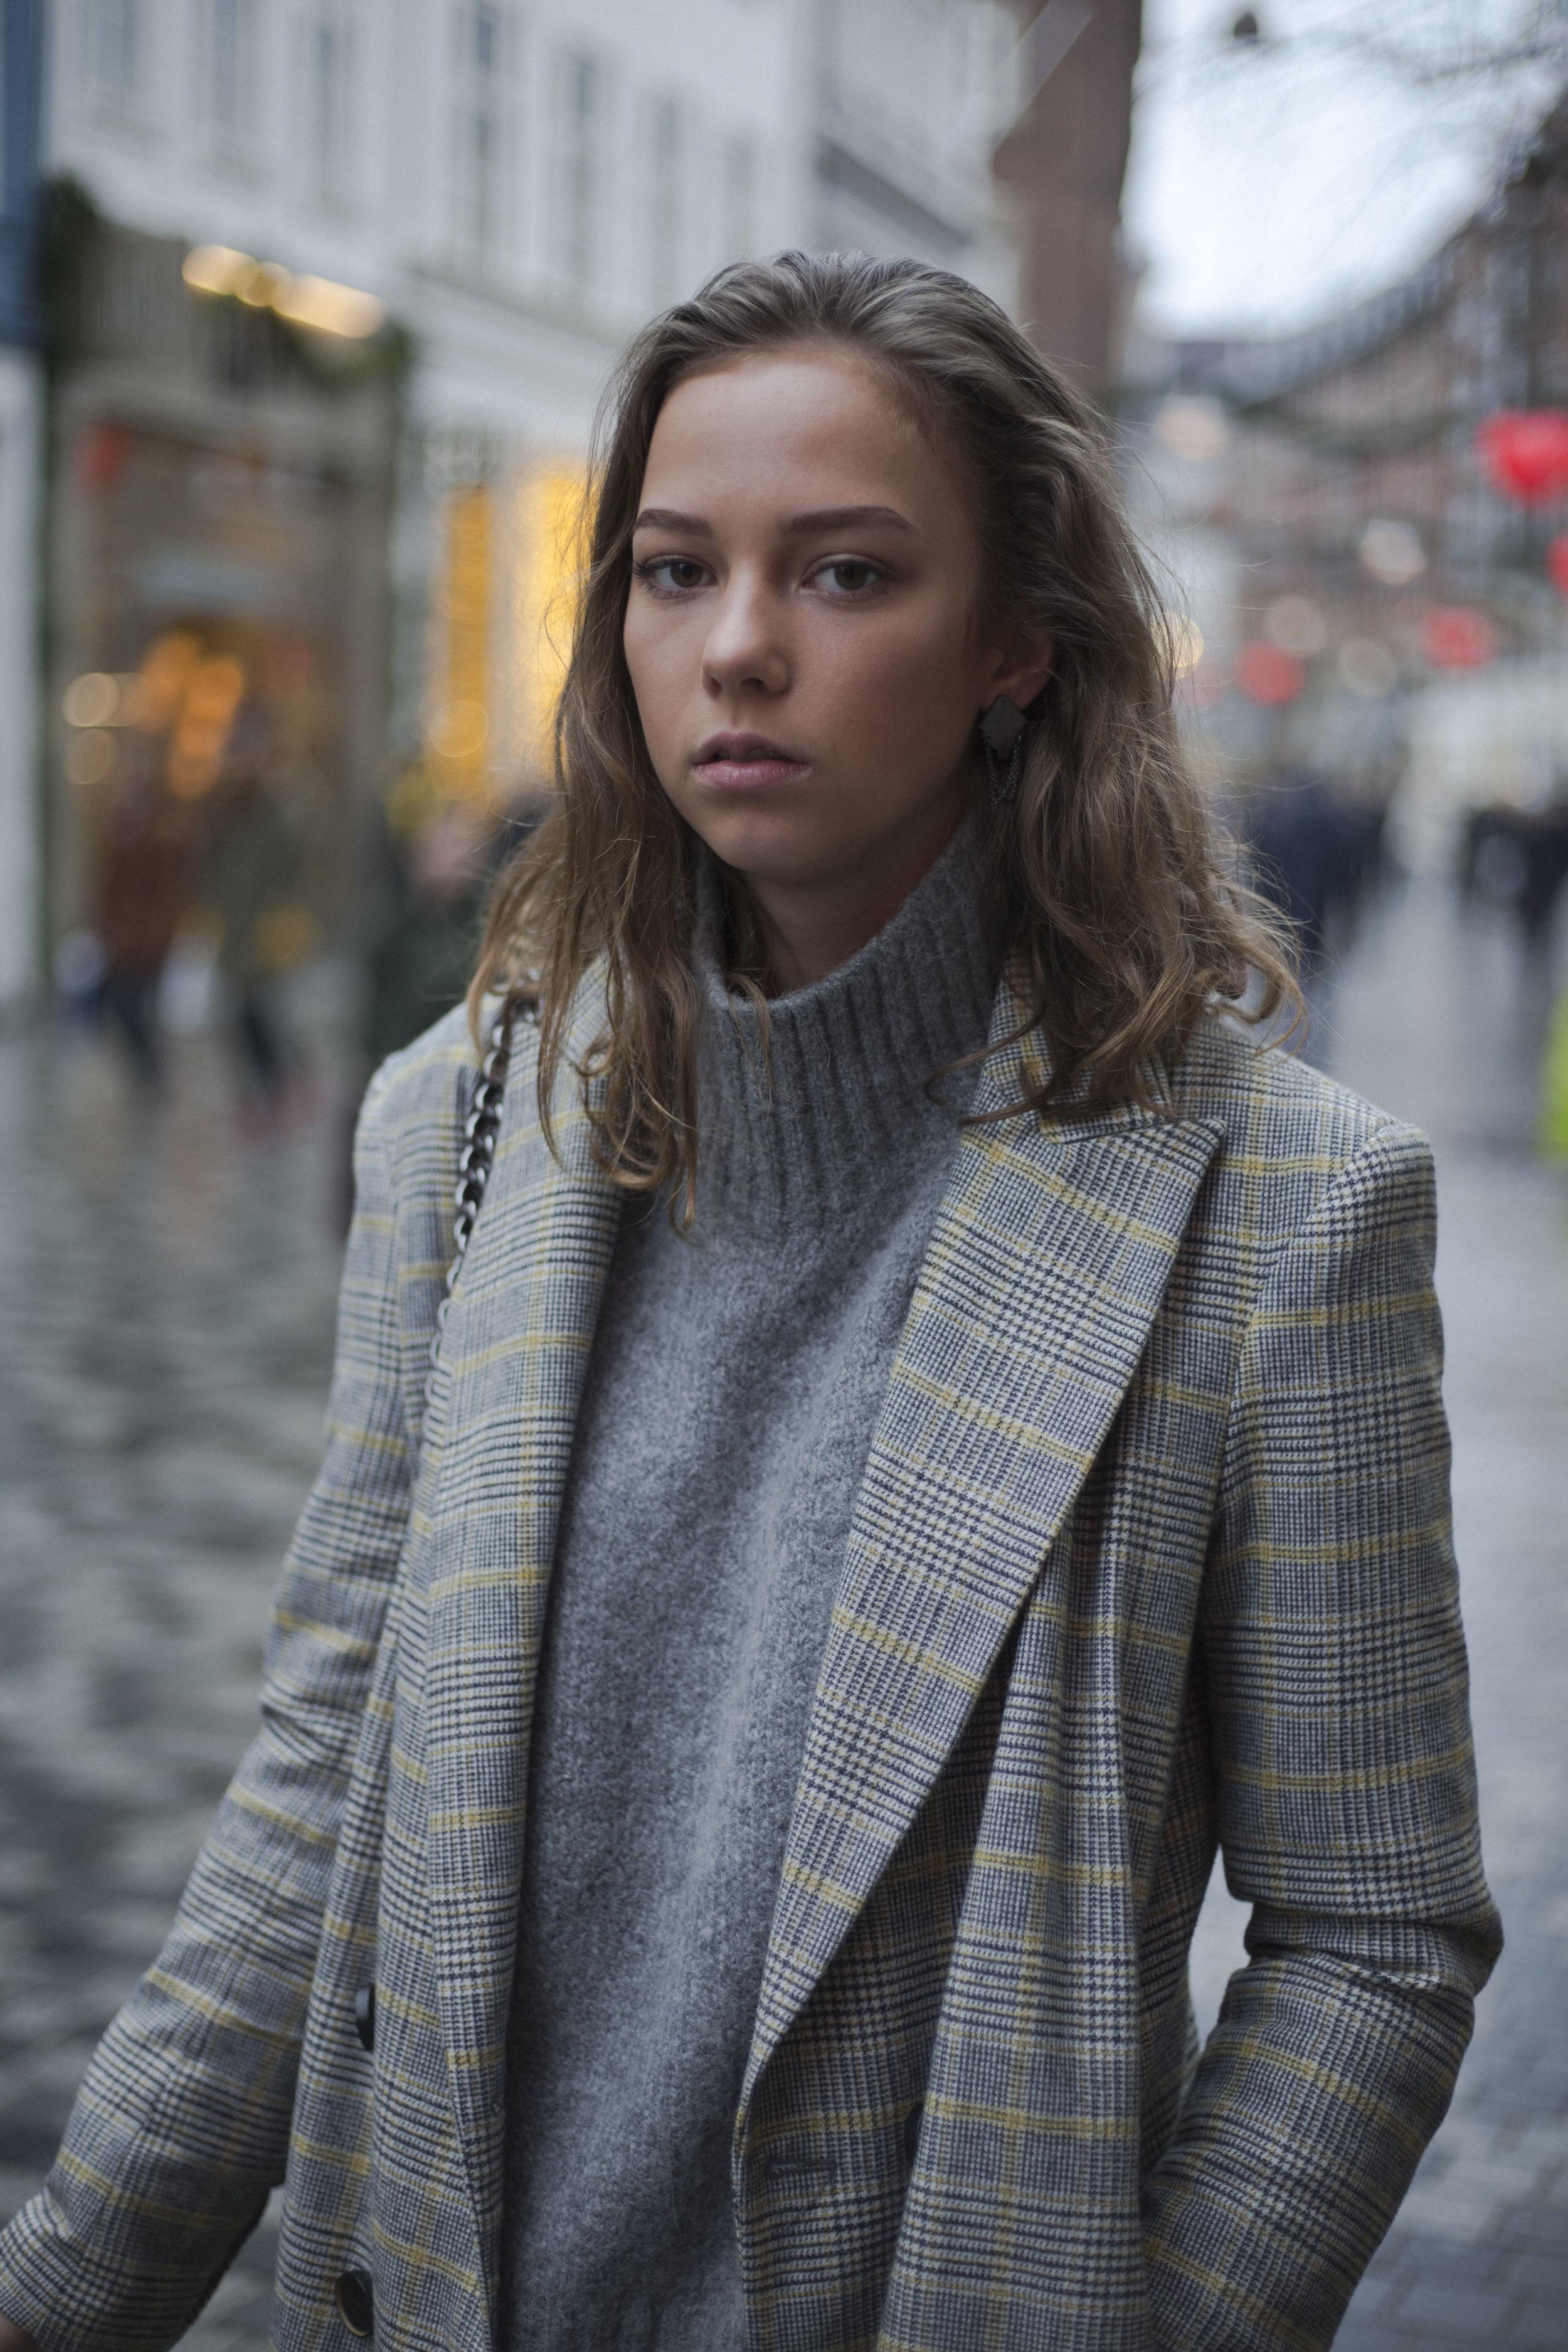 copenhagen-denmark-fashion-streetstyle-blog-onthestreets-thestreetland-portraits-fashionweek-layering-style-filippak-zarah-nikeair-h&m